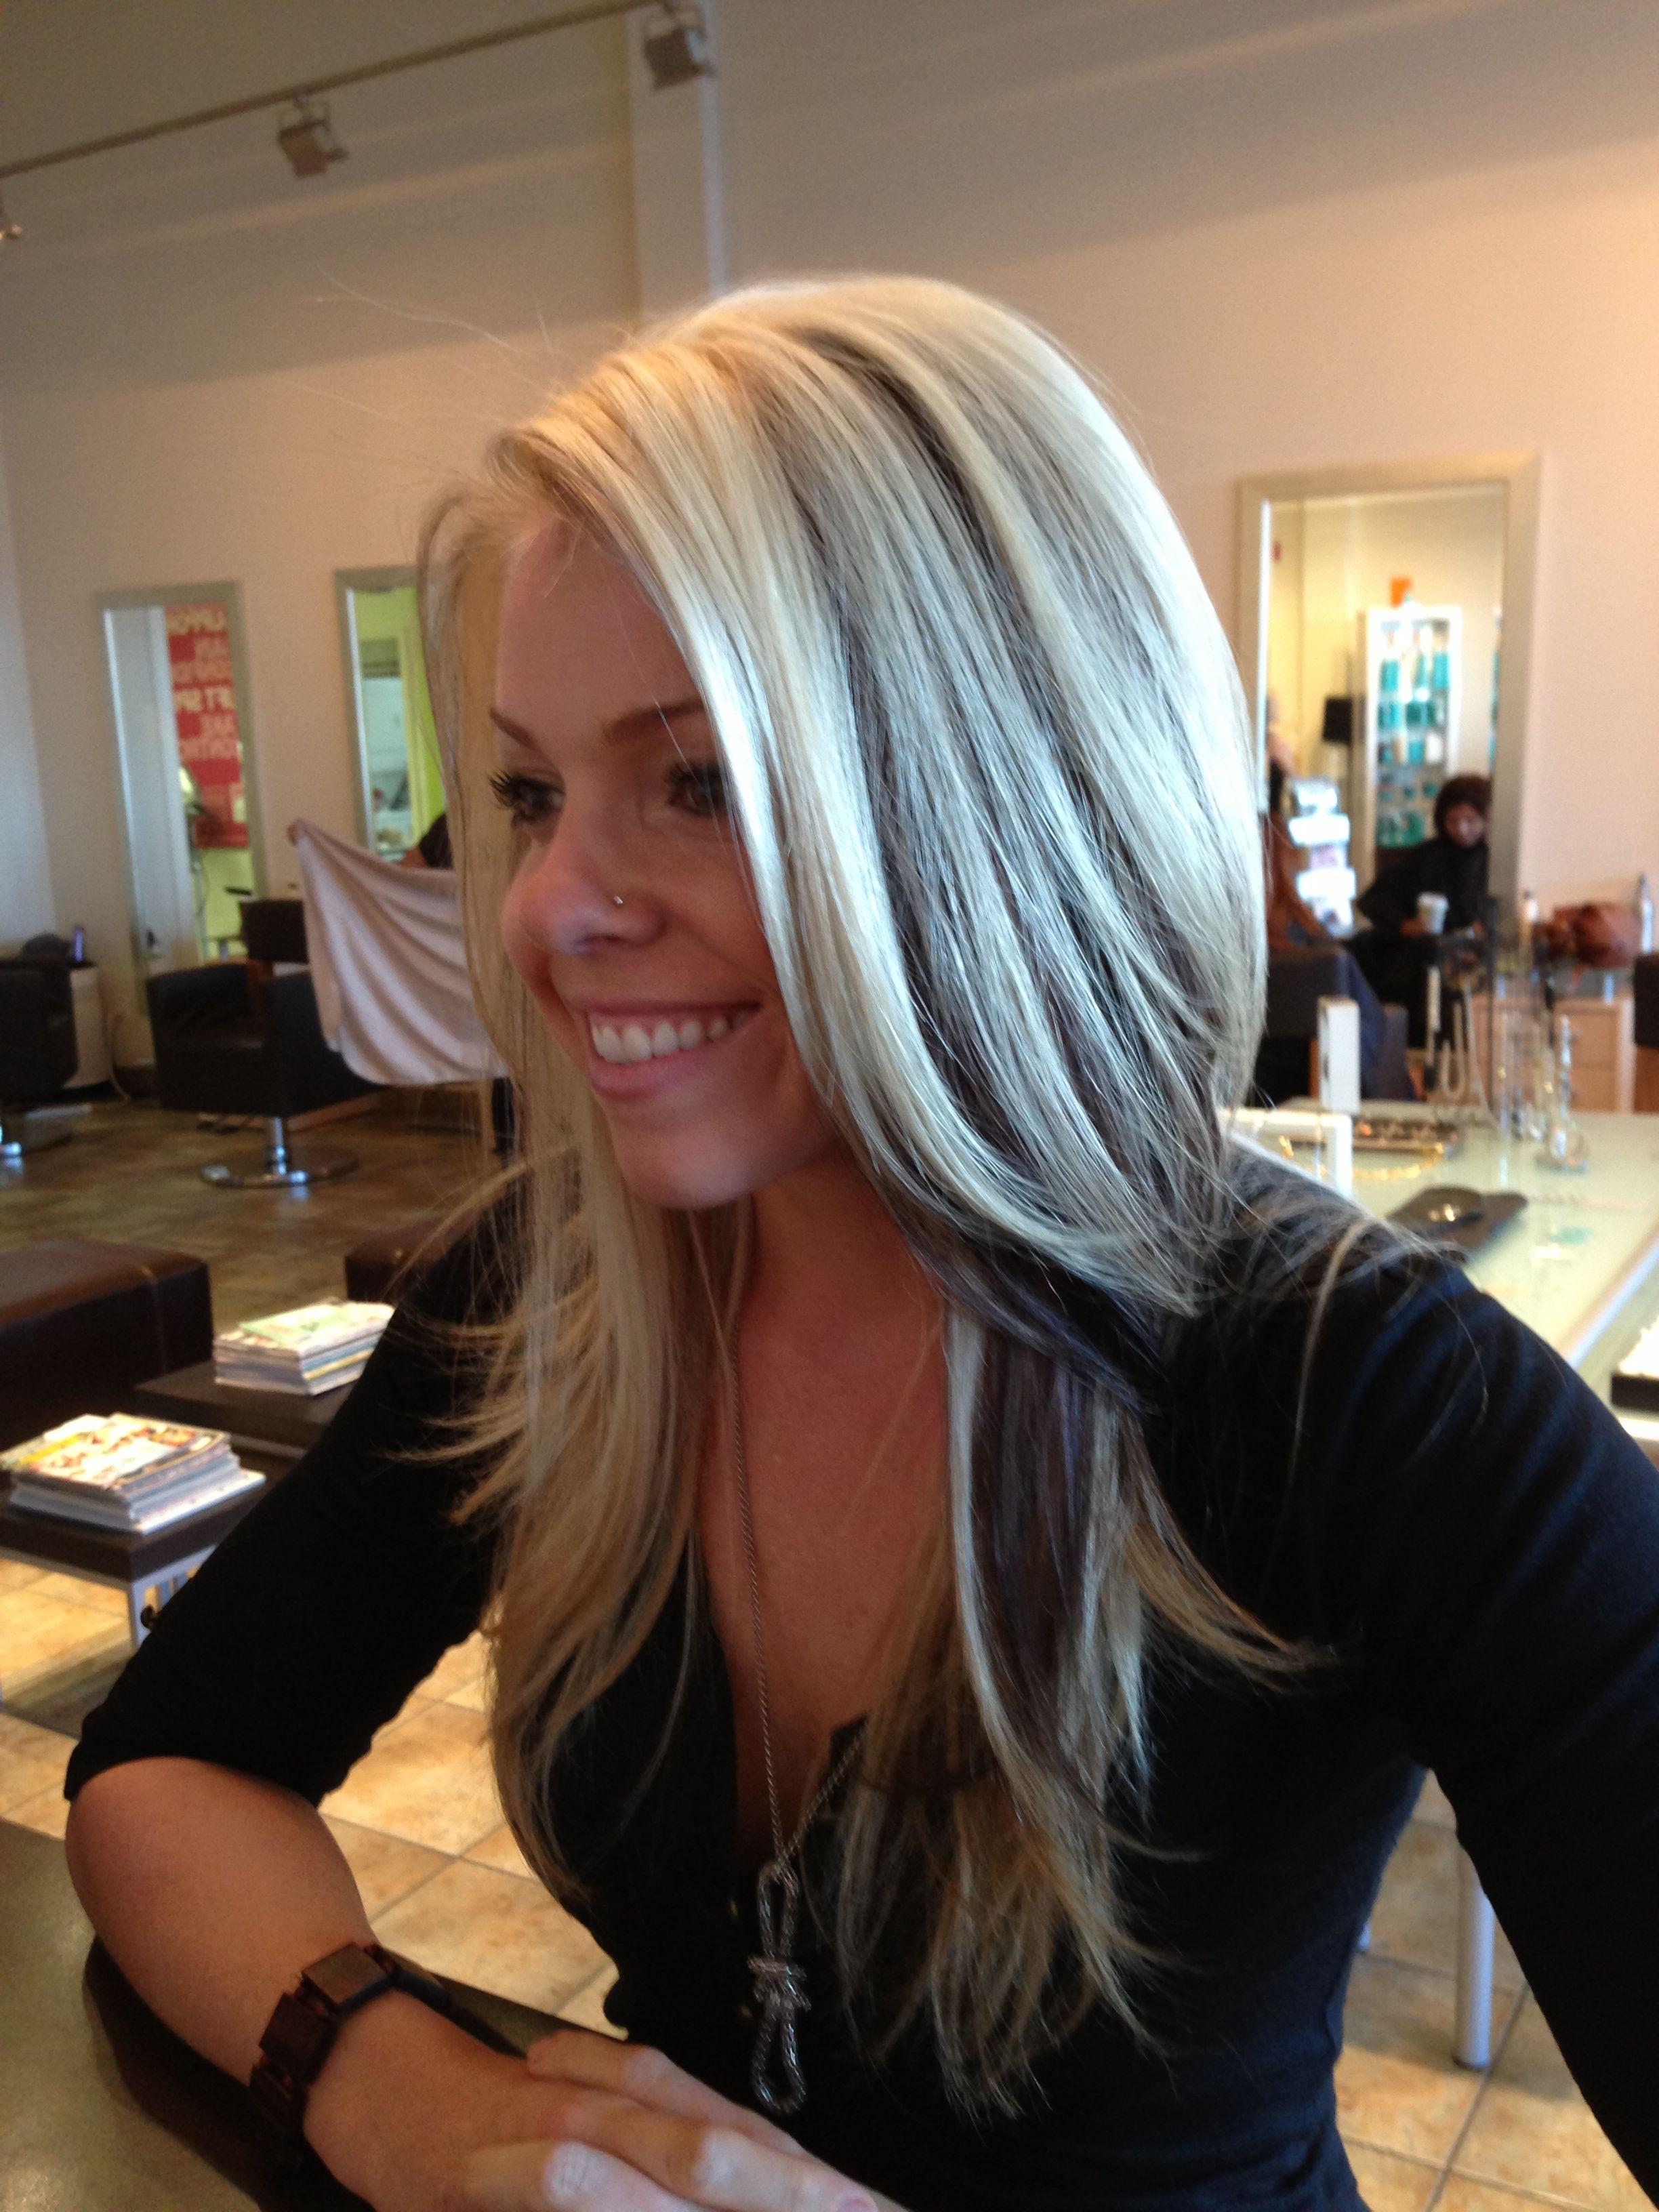 Pin by Hannah Hudson on Hair!!! | Pinterest